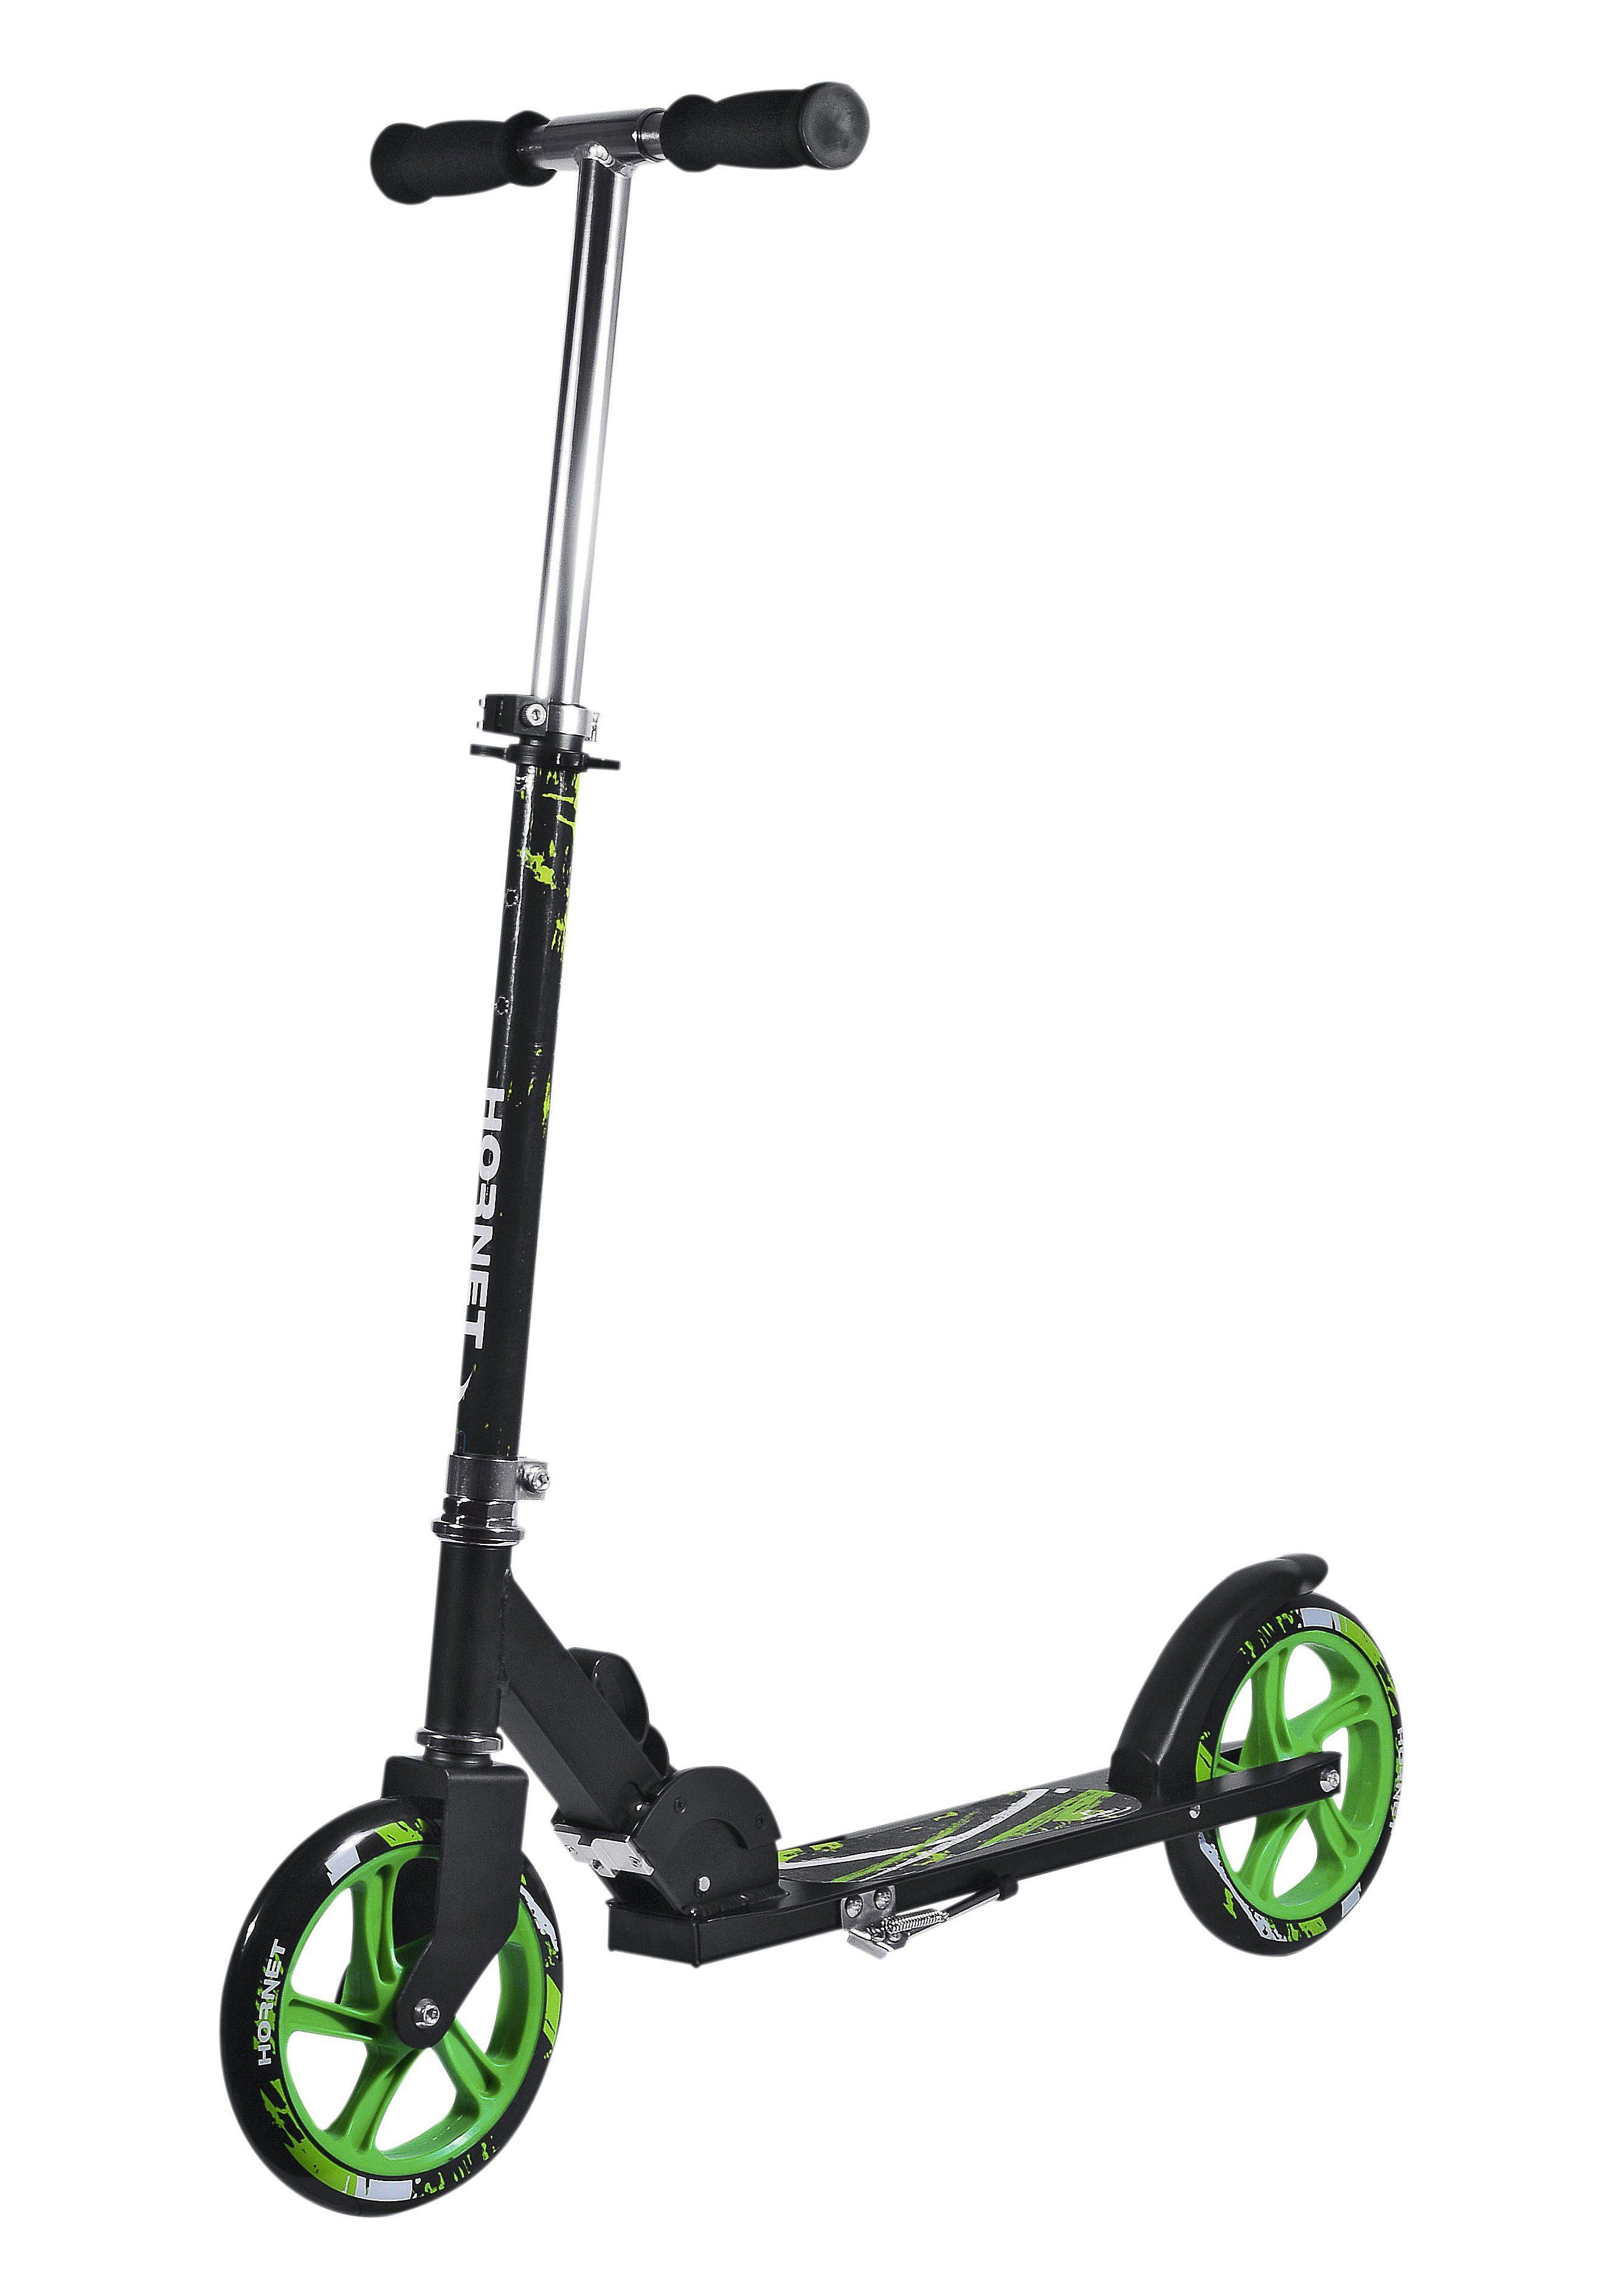 Alu-Scooter, Hudora, »Hornet 205«, schwarz-grün